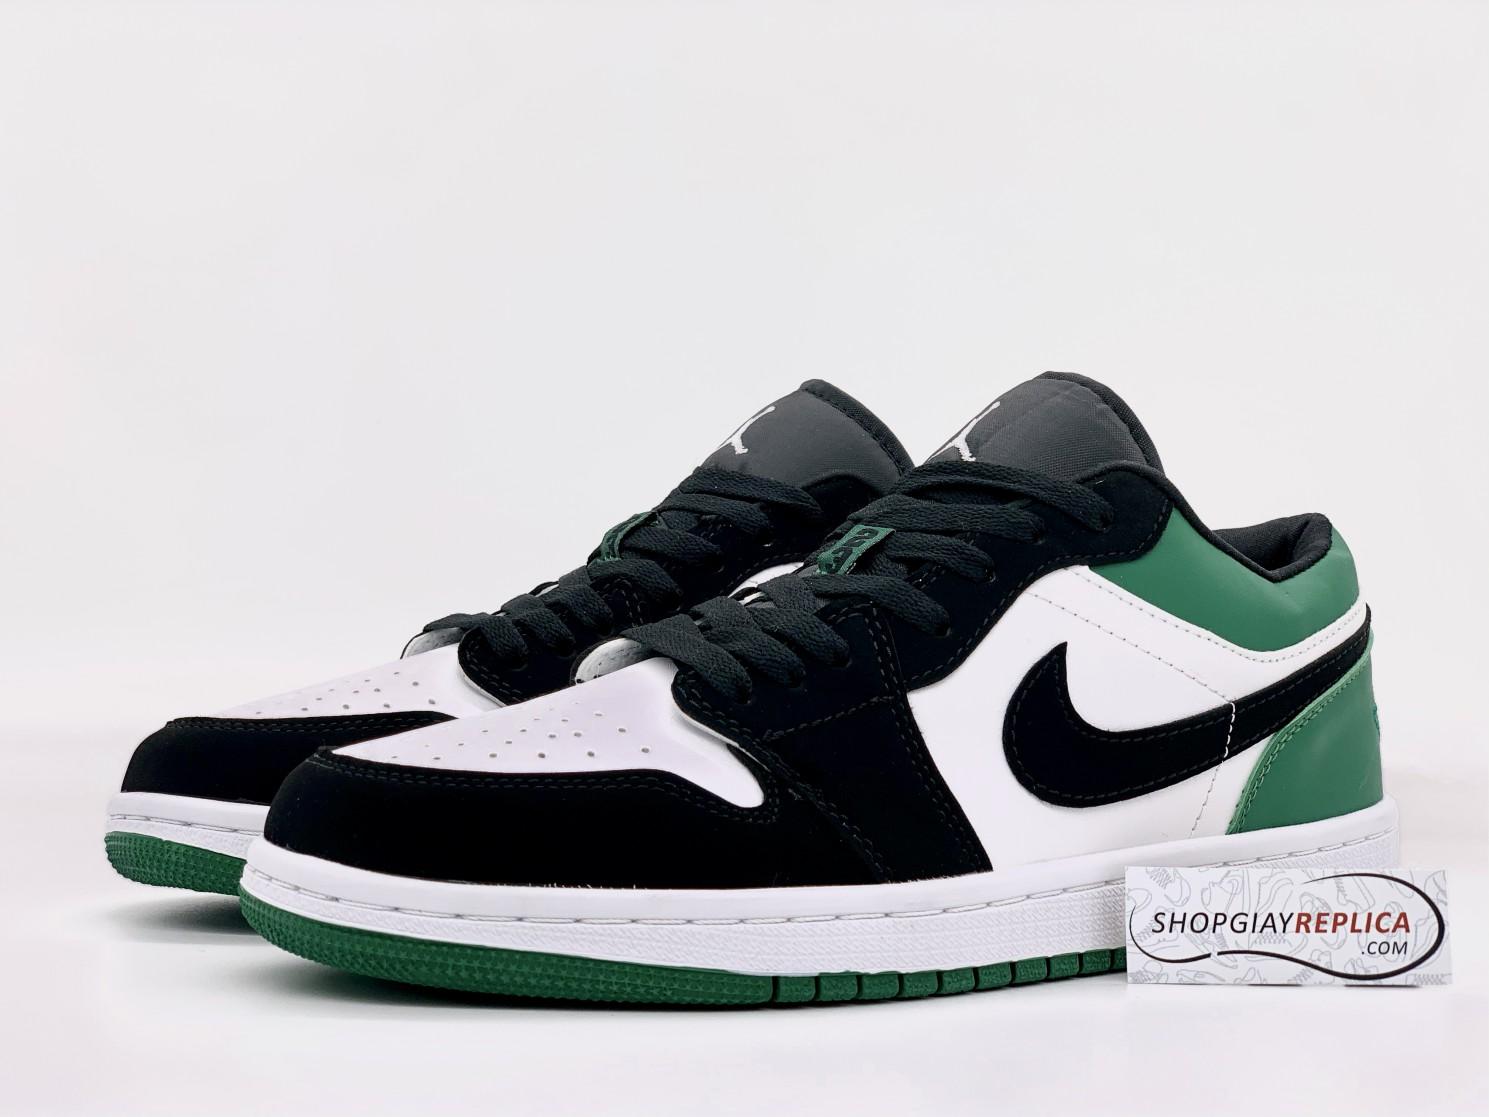 giày jordan xanh đen